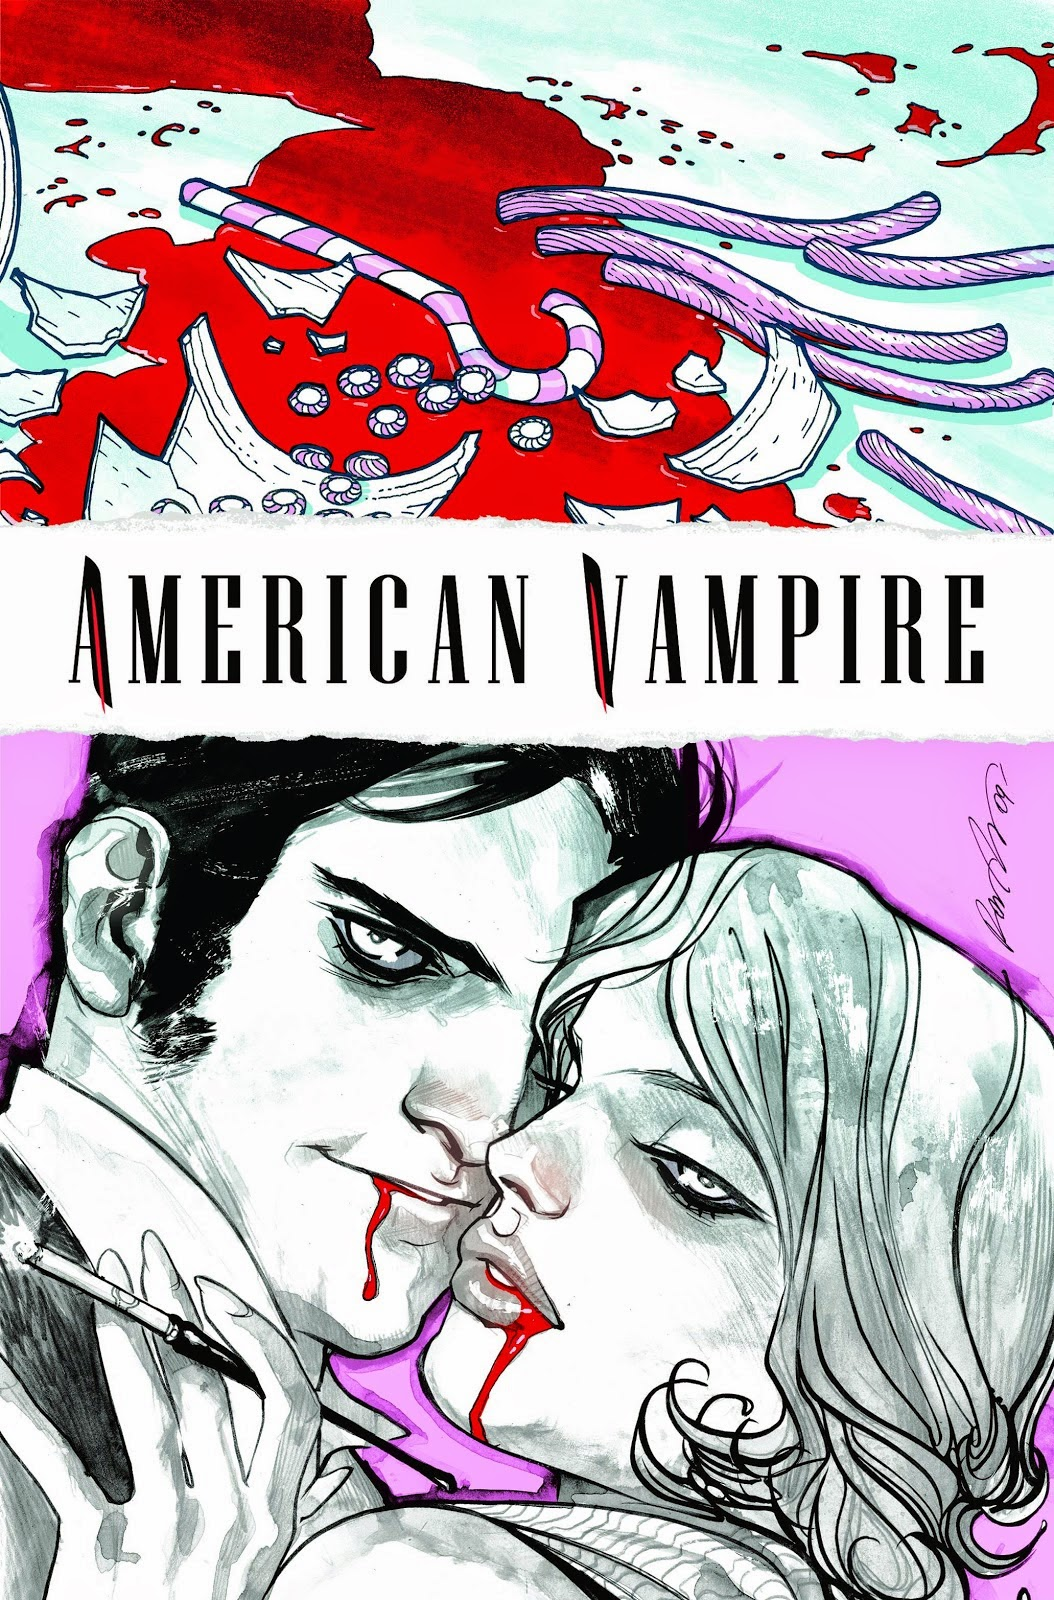 http://superheroesrevelados.blogspot.com.ar/2012/10/american-vampire.html